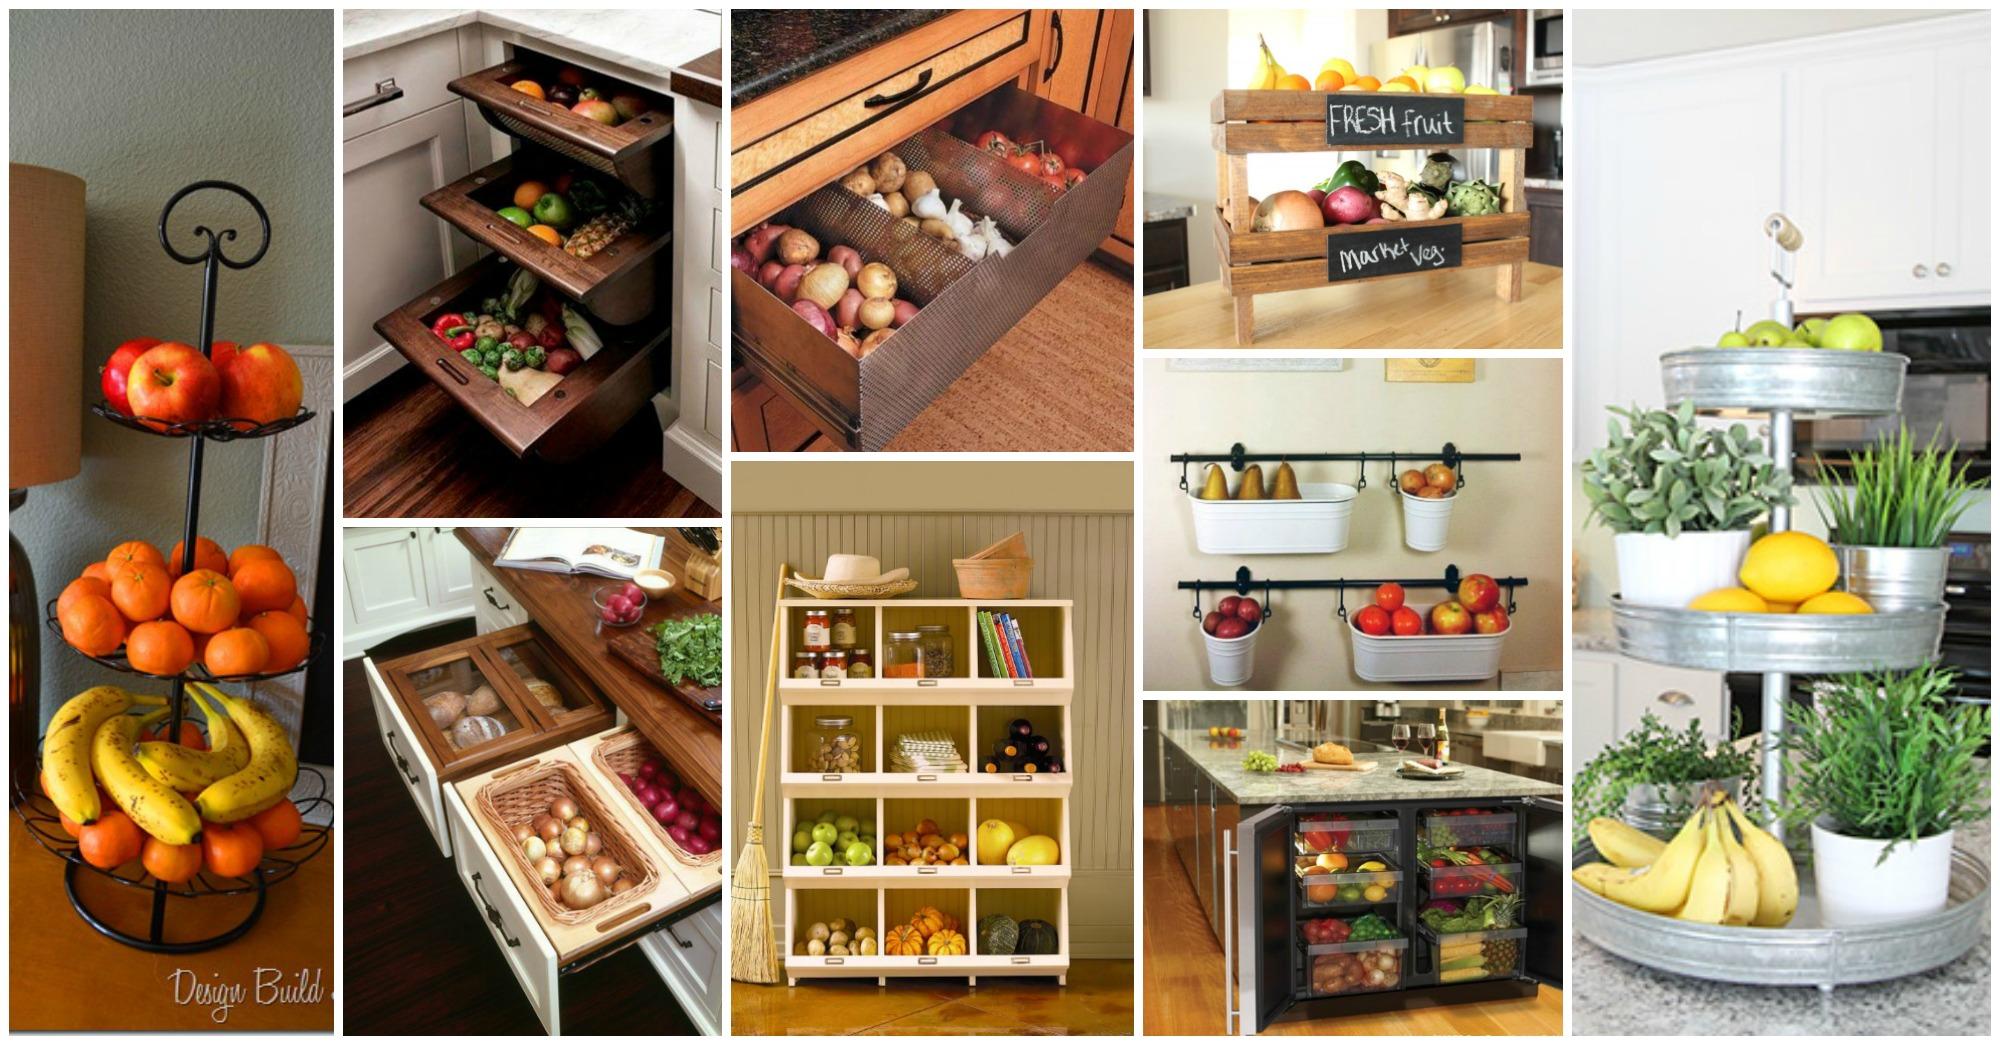 Best Way To Store Vegetables In Kitchen